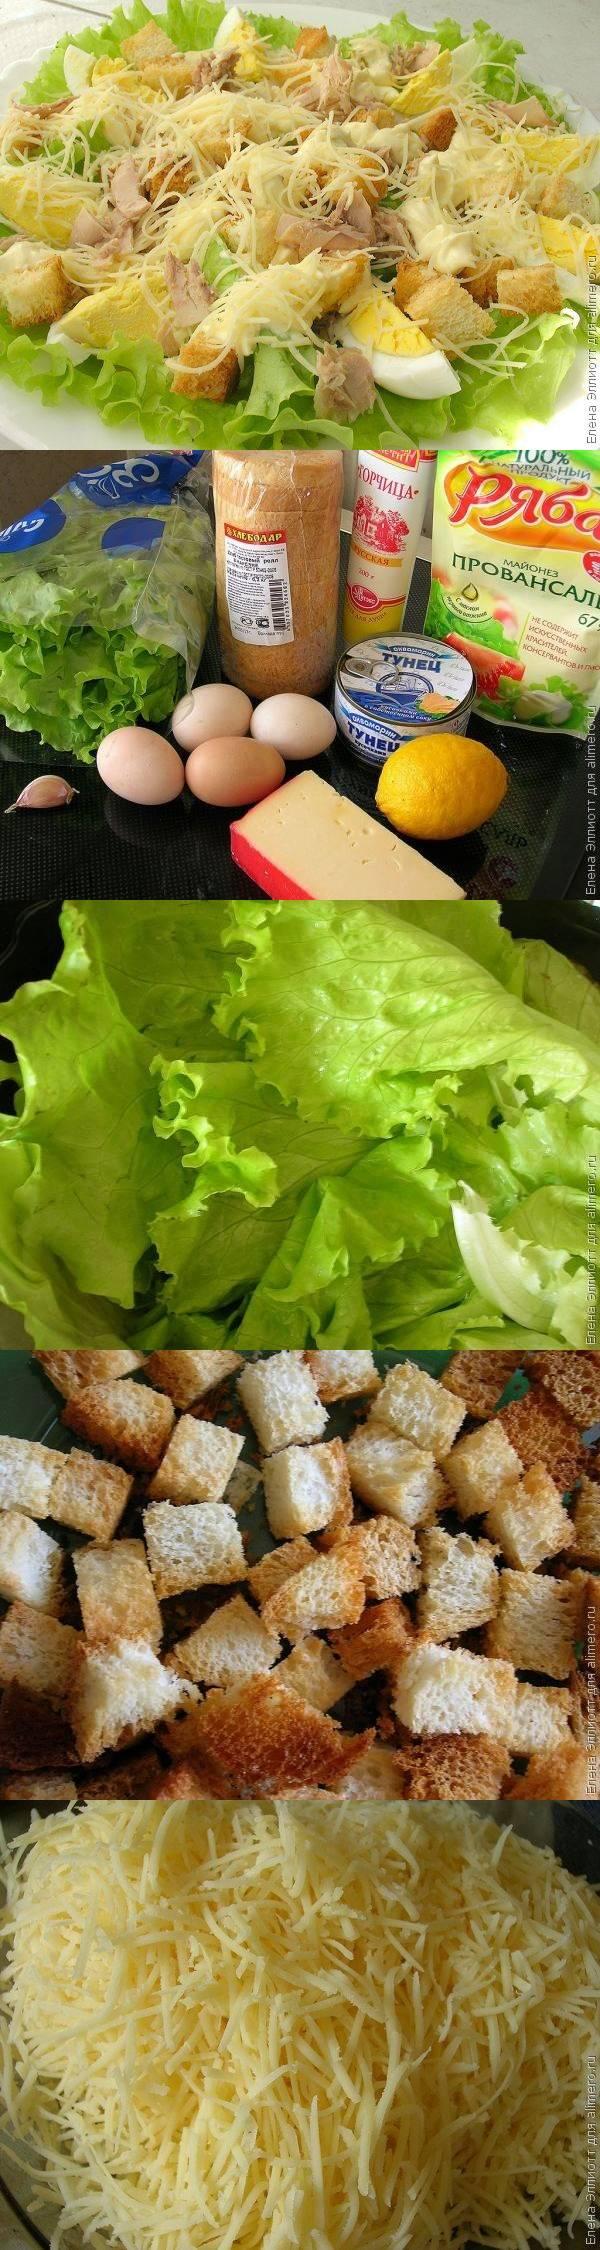 Салат цезарь и пошаговый рецепт